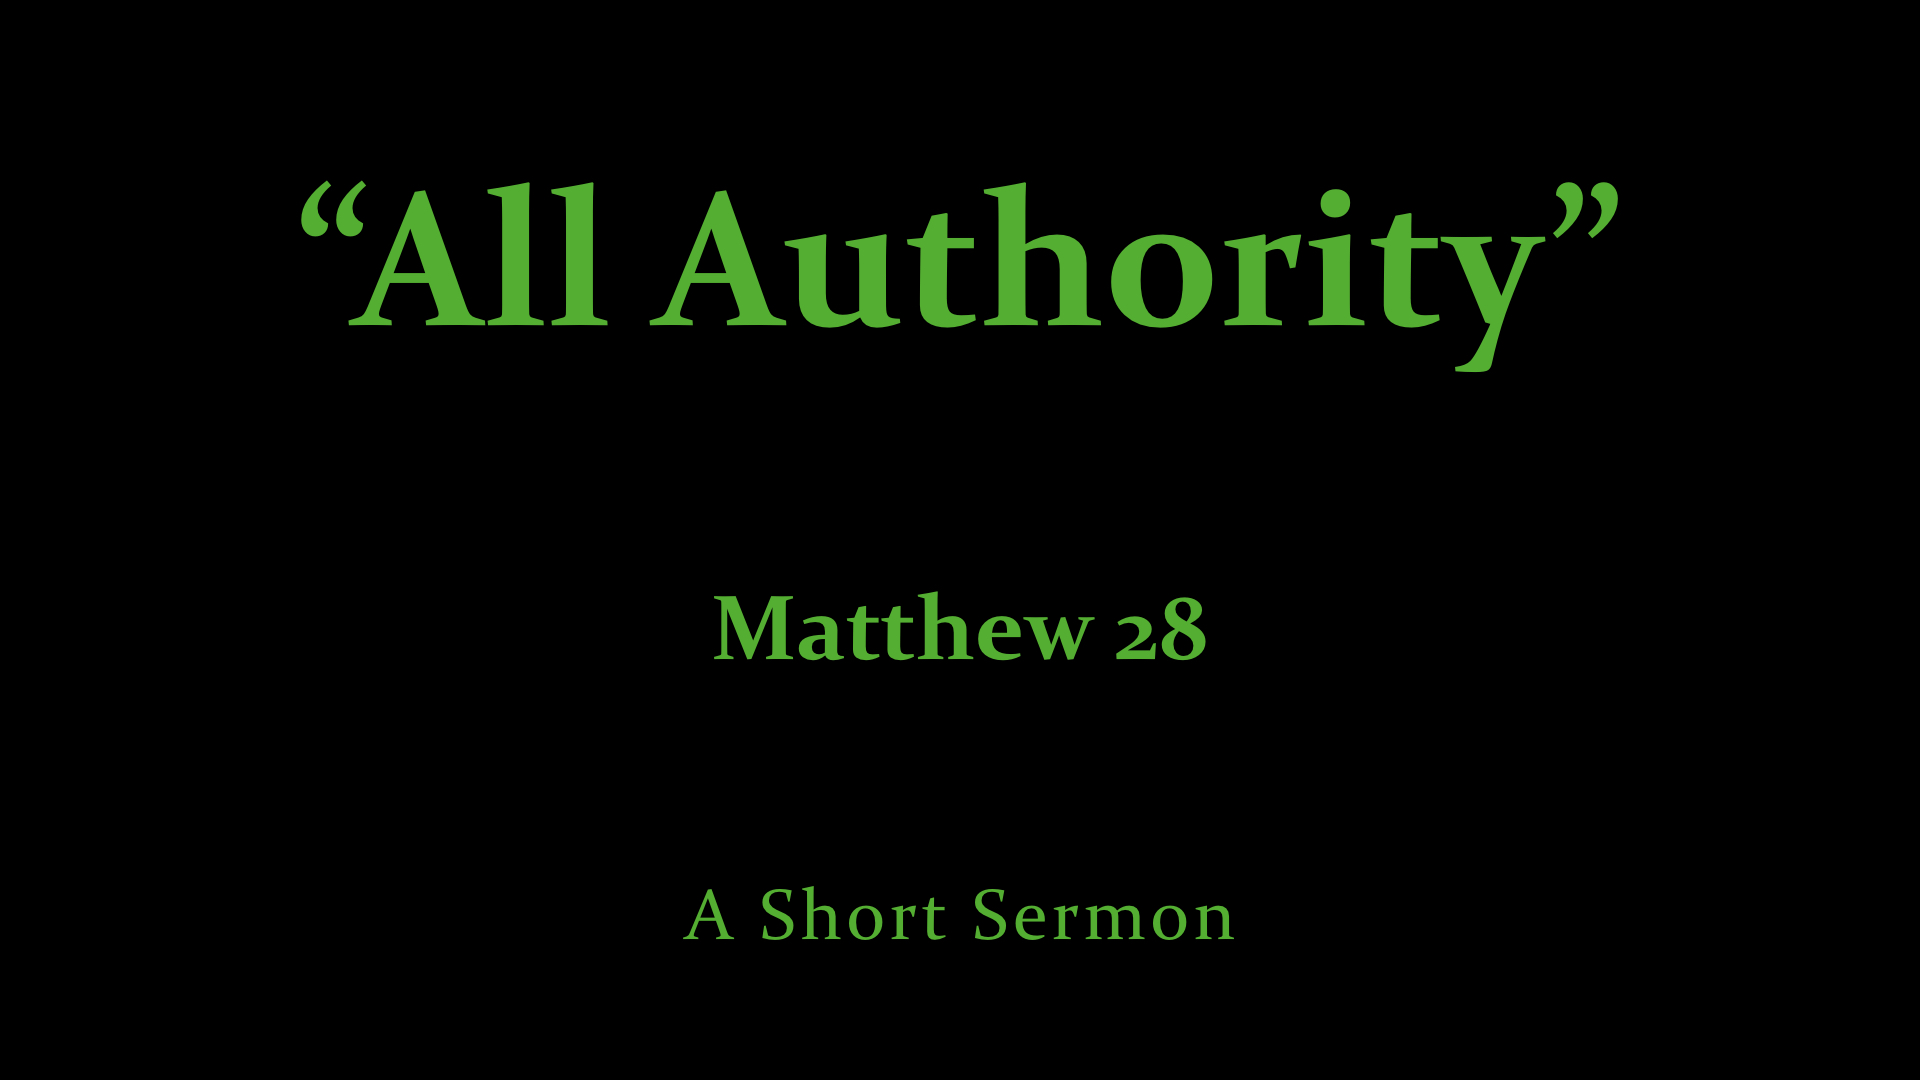 All Authority - A Short Sermon.jpeg